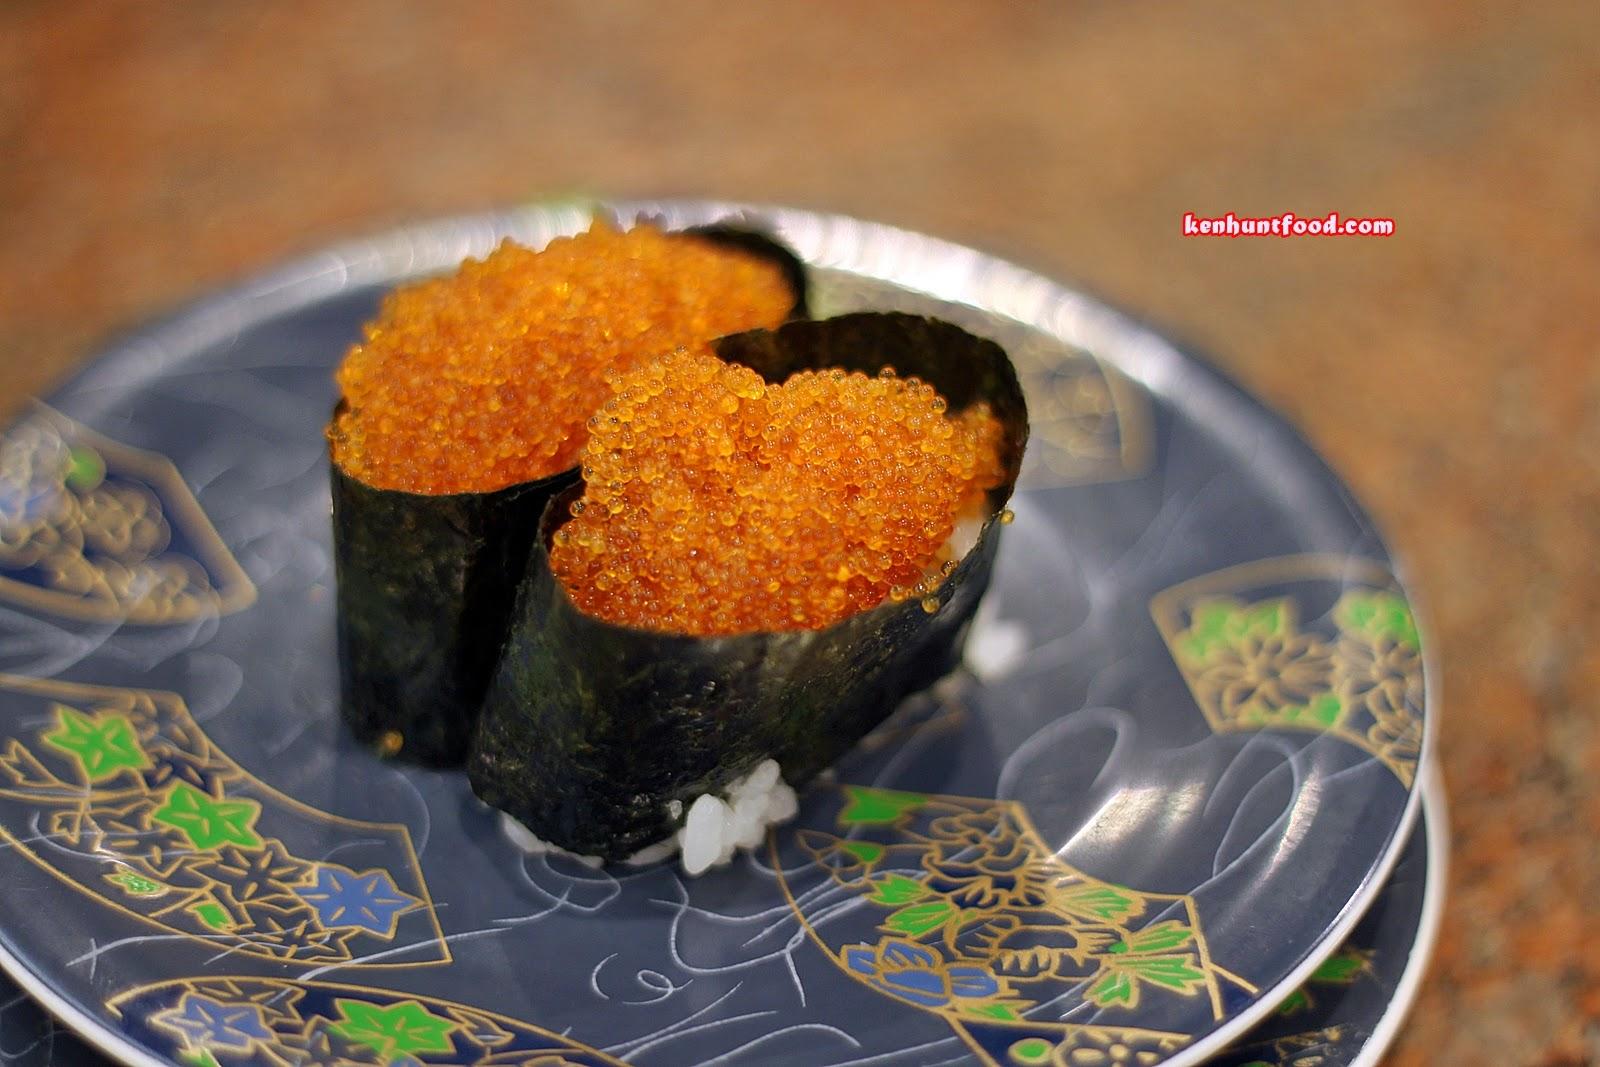 Ken hunts food travel itinerary to sapporo hokkaido for Flying fish roe